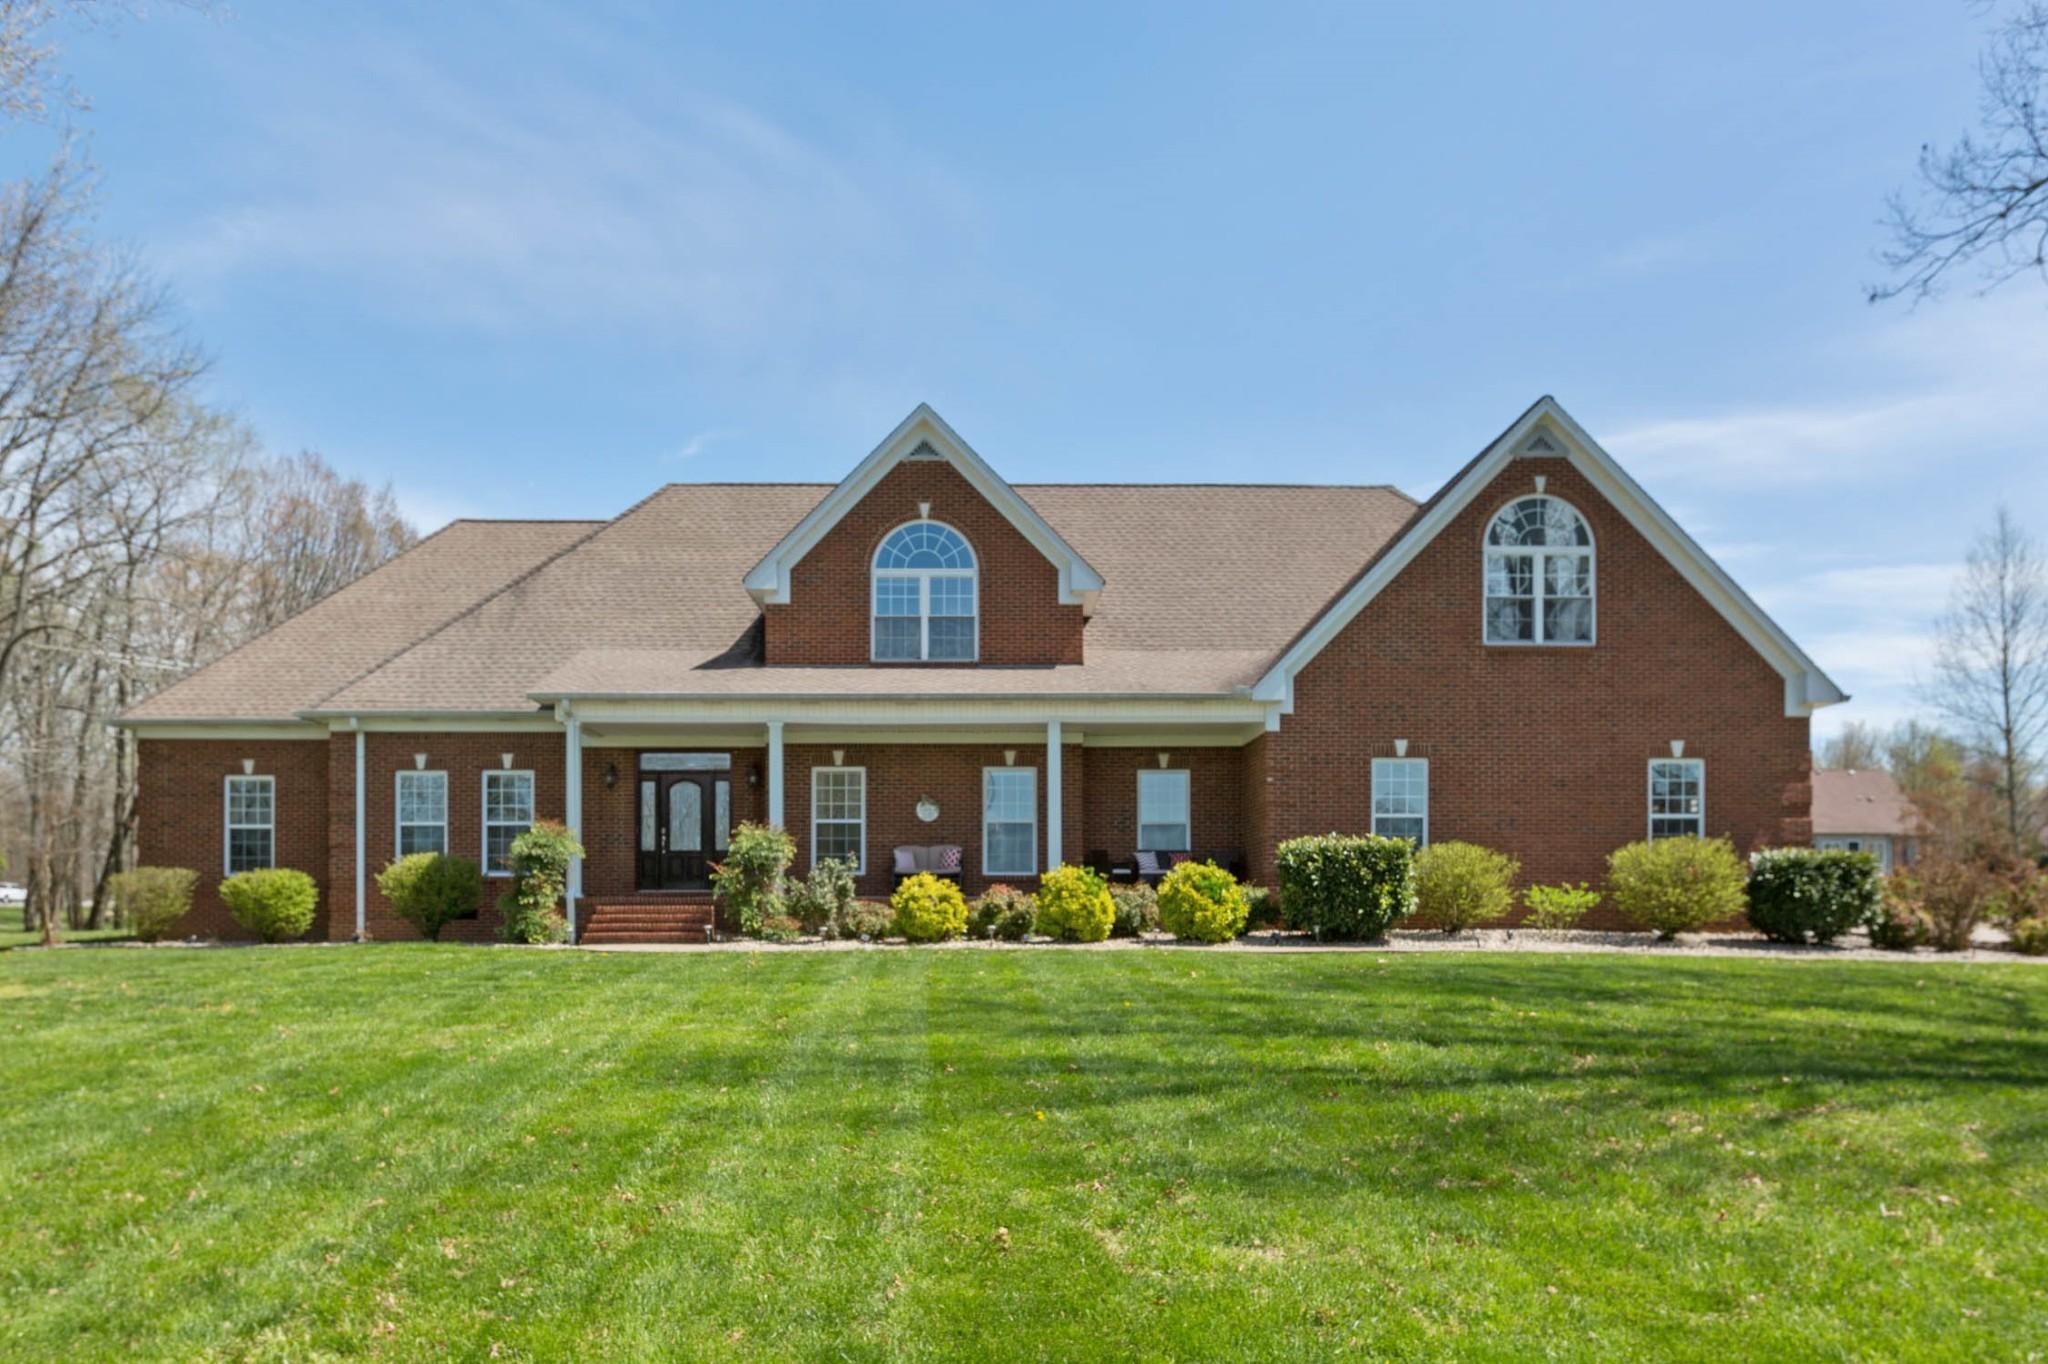 234 William Cir, Lafayette, TN 37083 - Lafayette, TN real estate listing